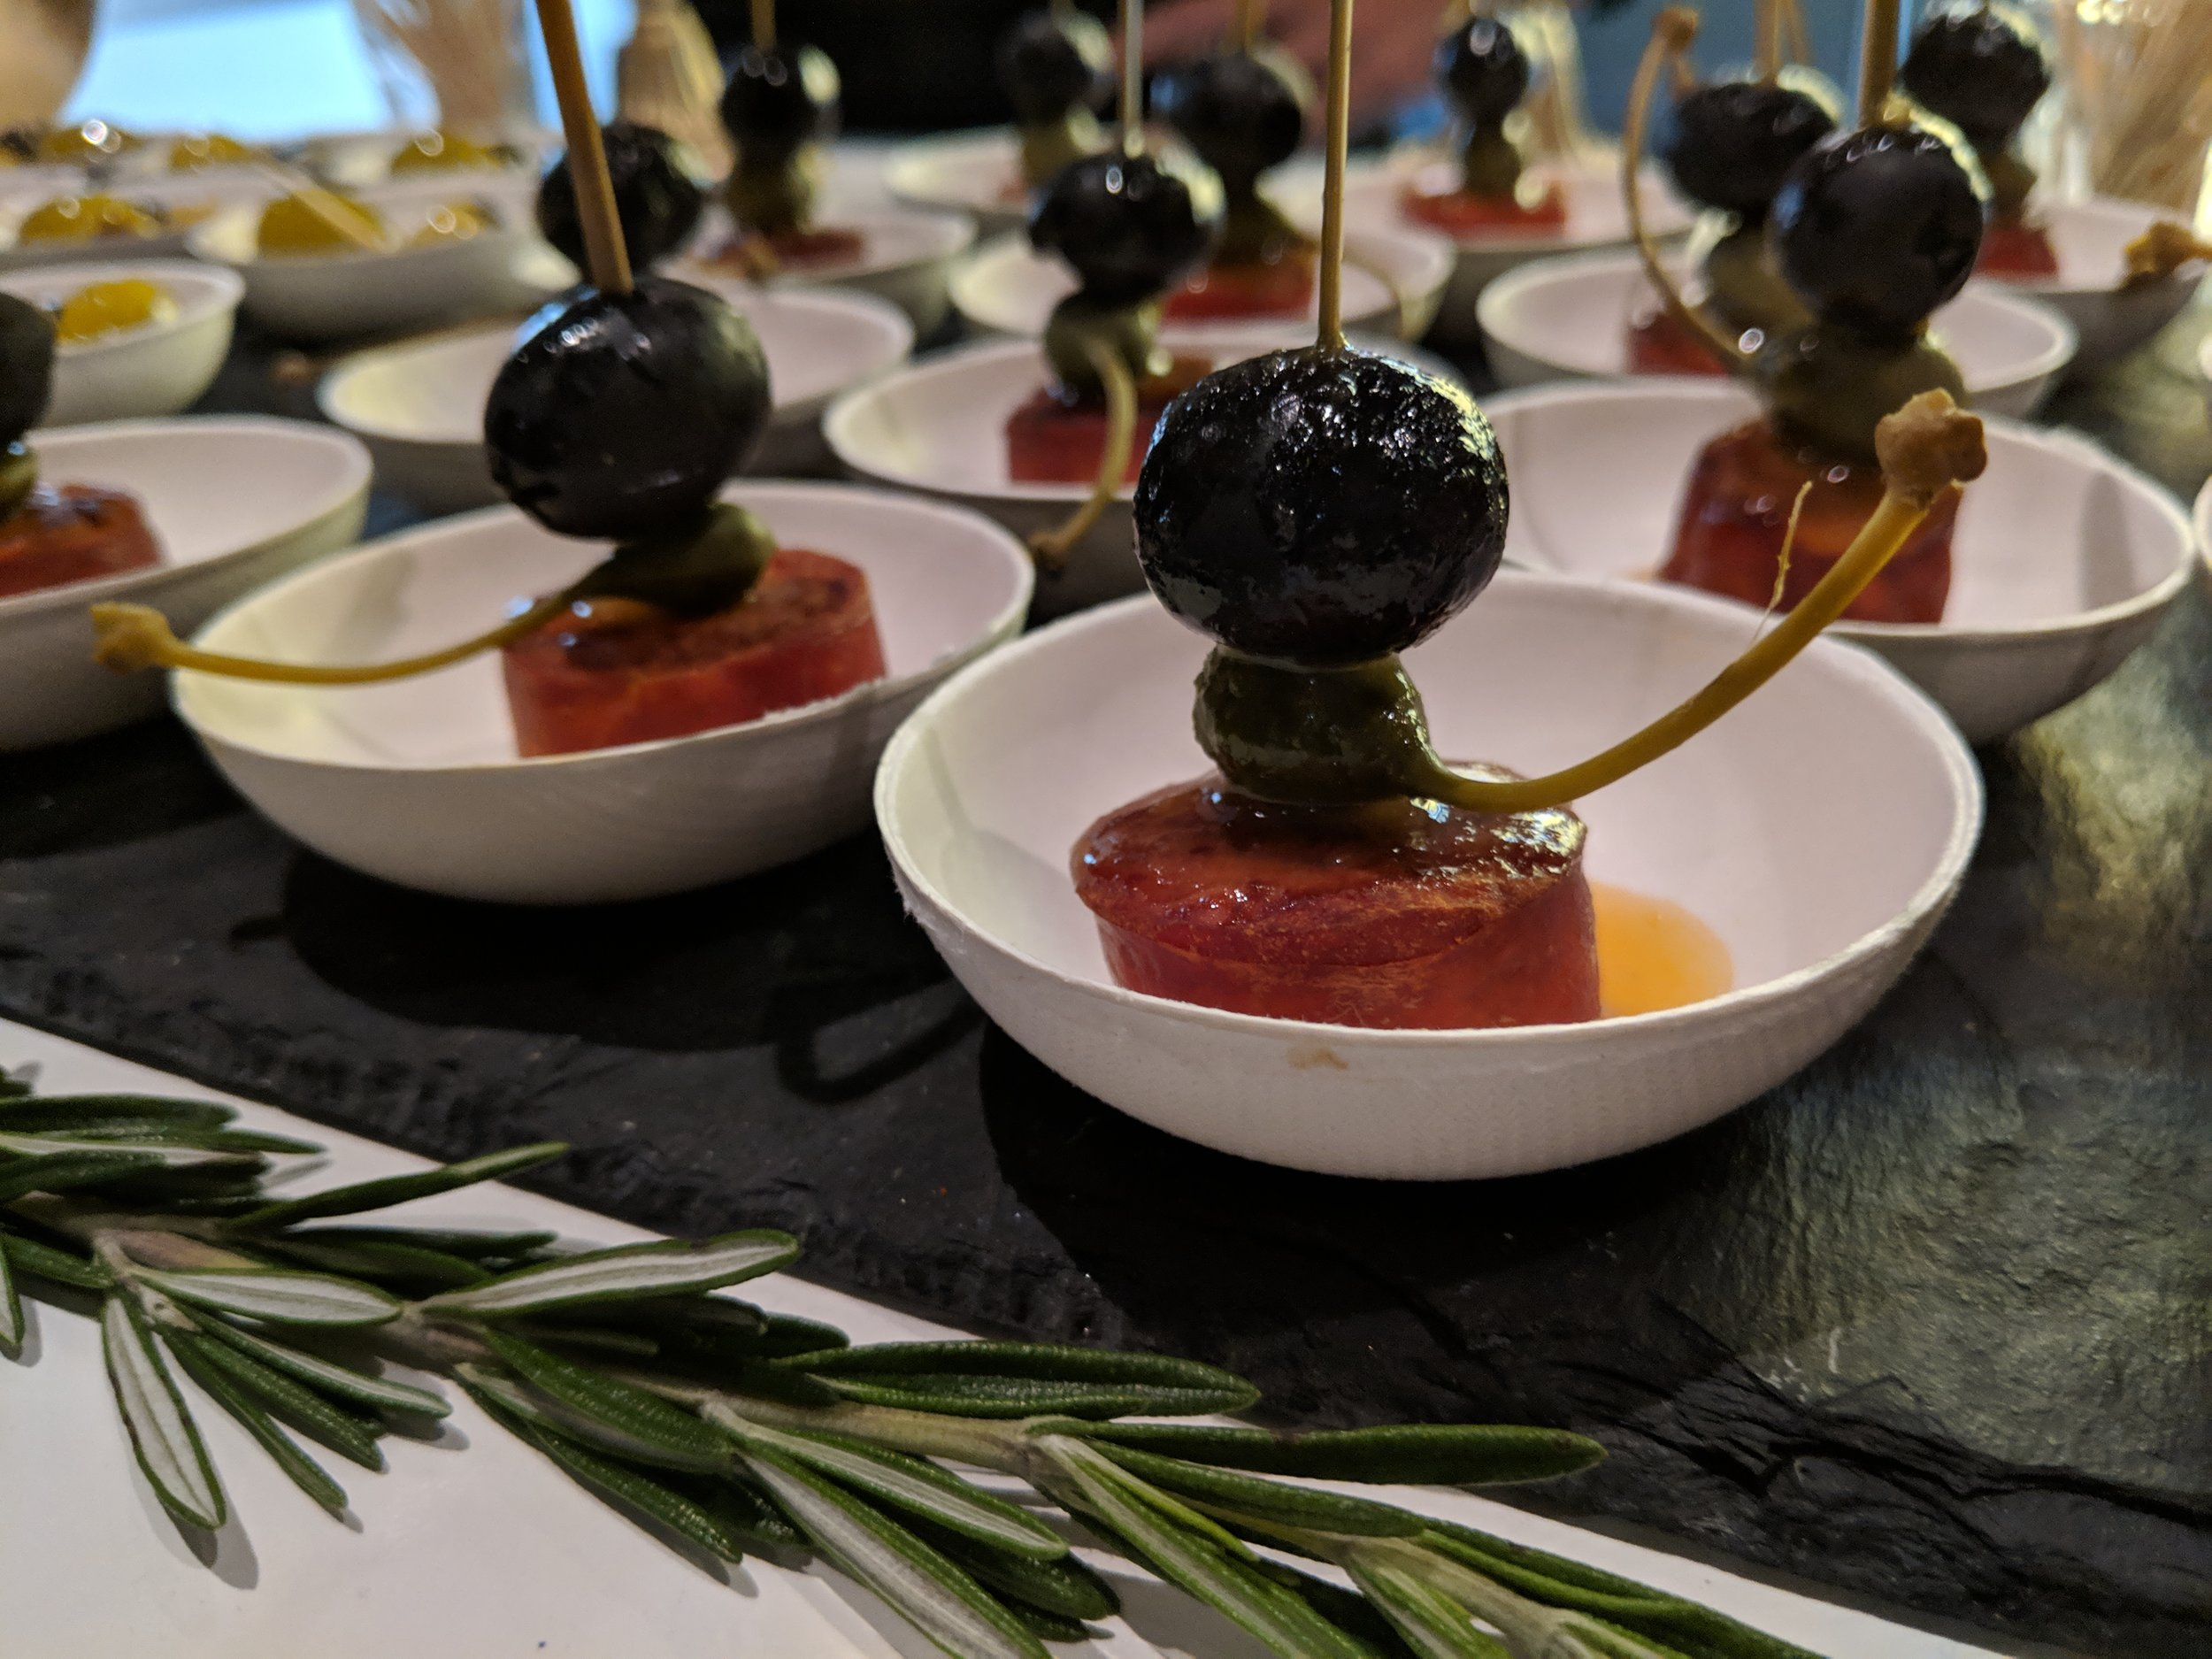 hojiblanca pintxos olives from spain